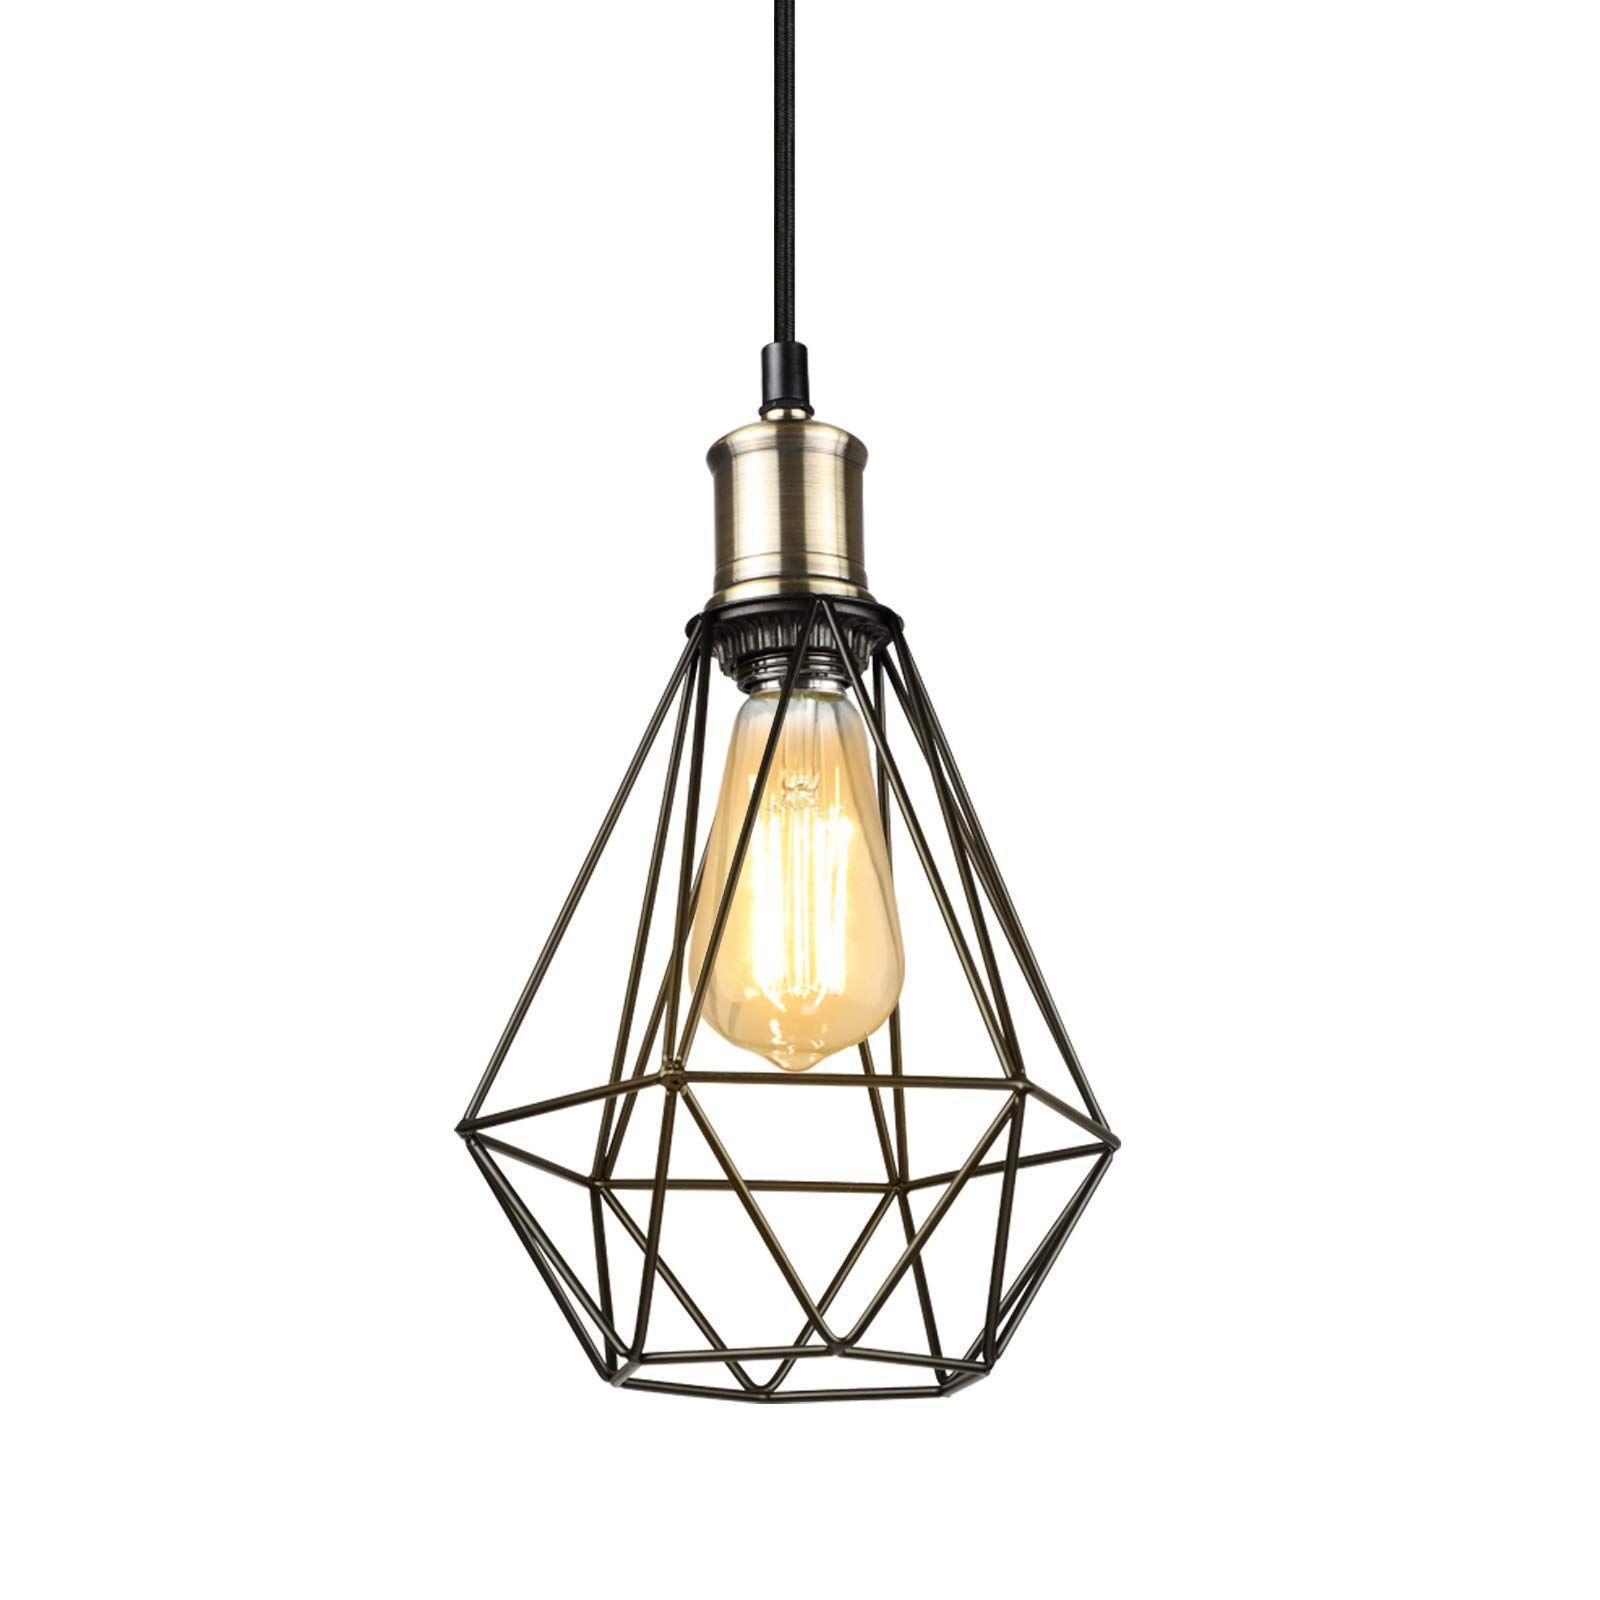 Ascher Industrial Pendant Light Black Metal Cage Hanging Ceiling Lamp Adjustable Cord E26 Base Ceiling Lig Ceiling Lights Ceiling Lamp Hanging Ceiling Lamps